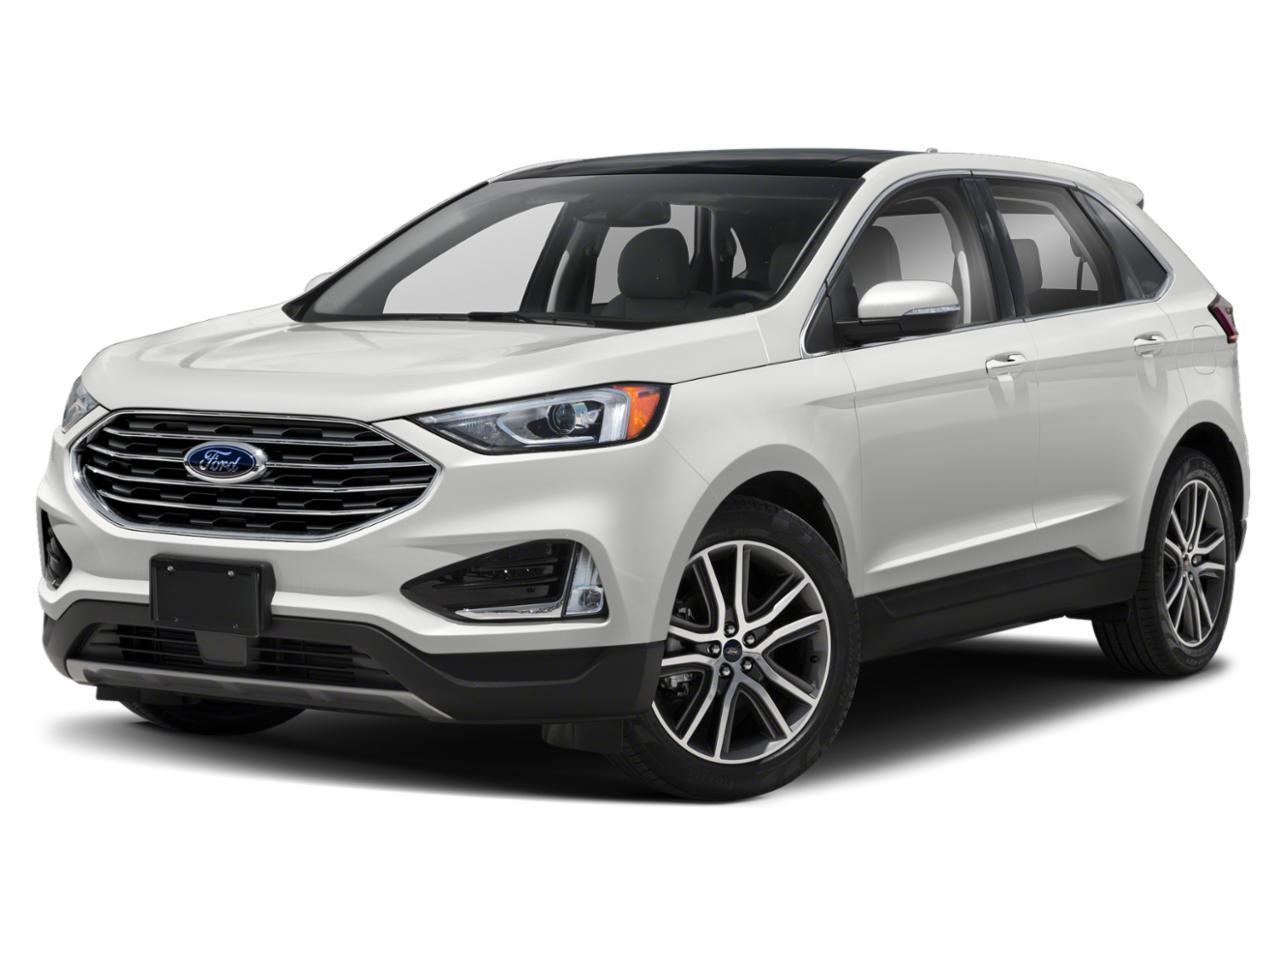 2019 Ford Edge Vehicle Photo in Worthington, MN 56187